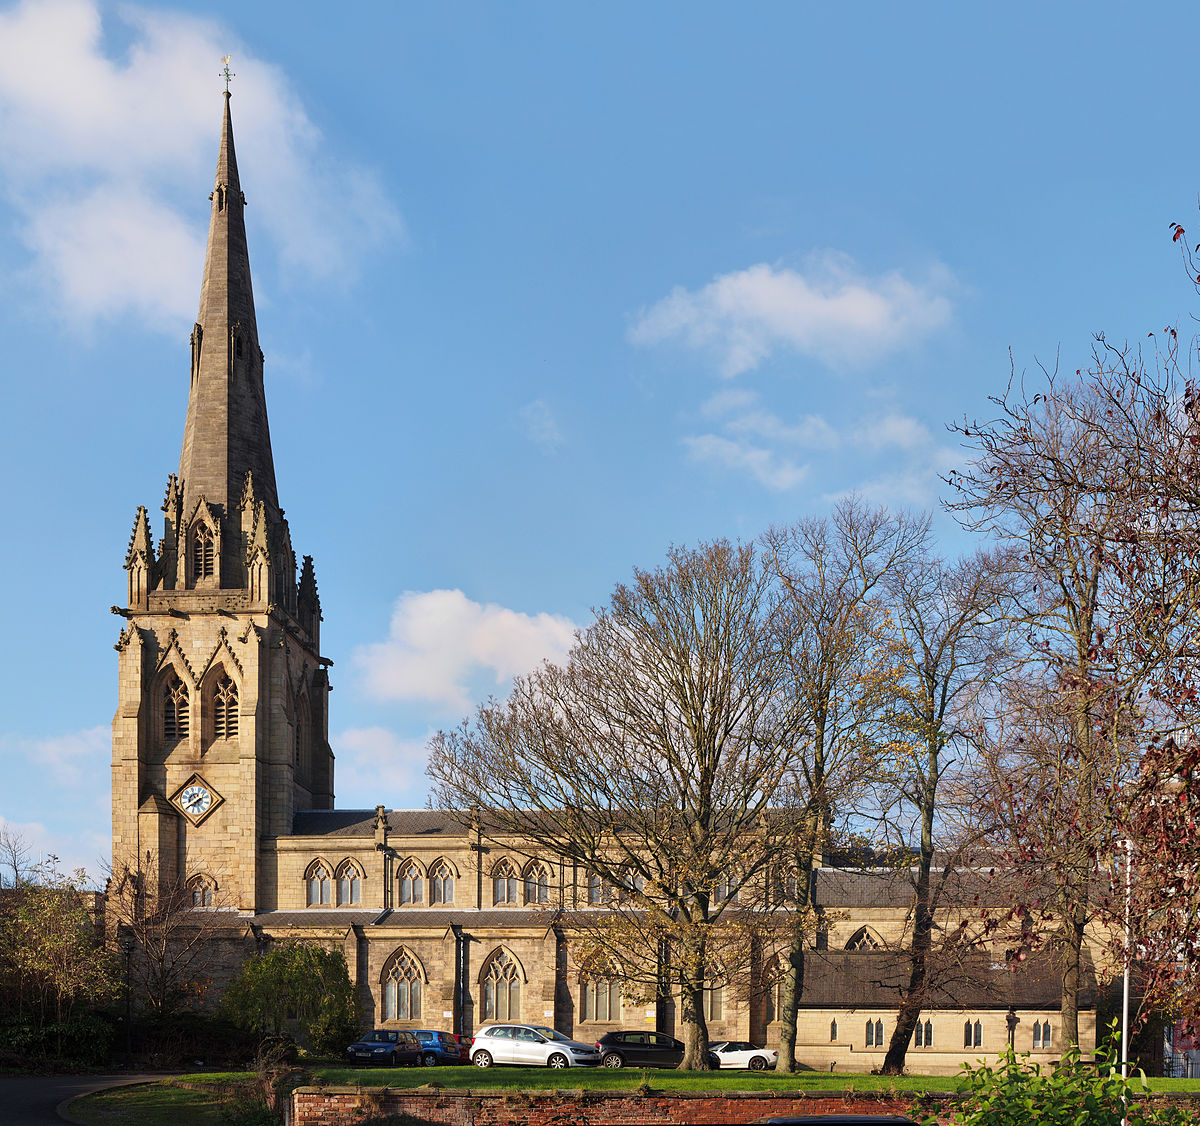 Attractive Anglican Church Church Of England #4: 1200px-St_John%27s_Minster_Pano.jpg